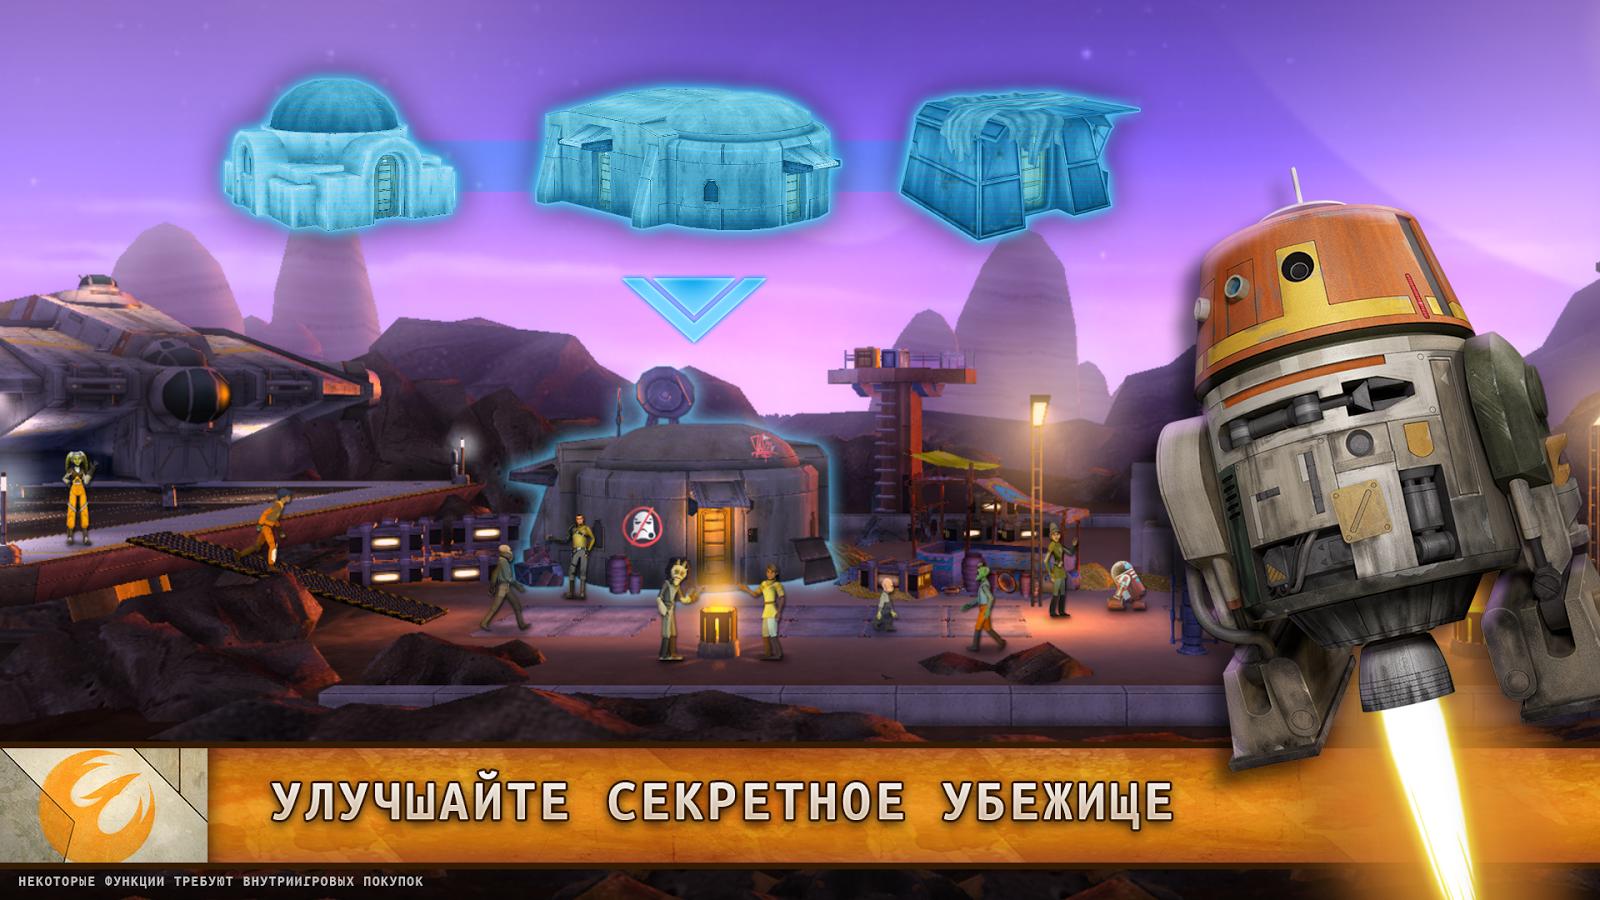 Звёздные войны повстанцы screenshot